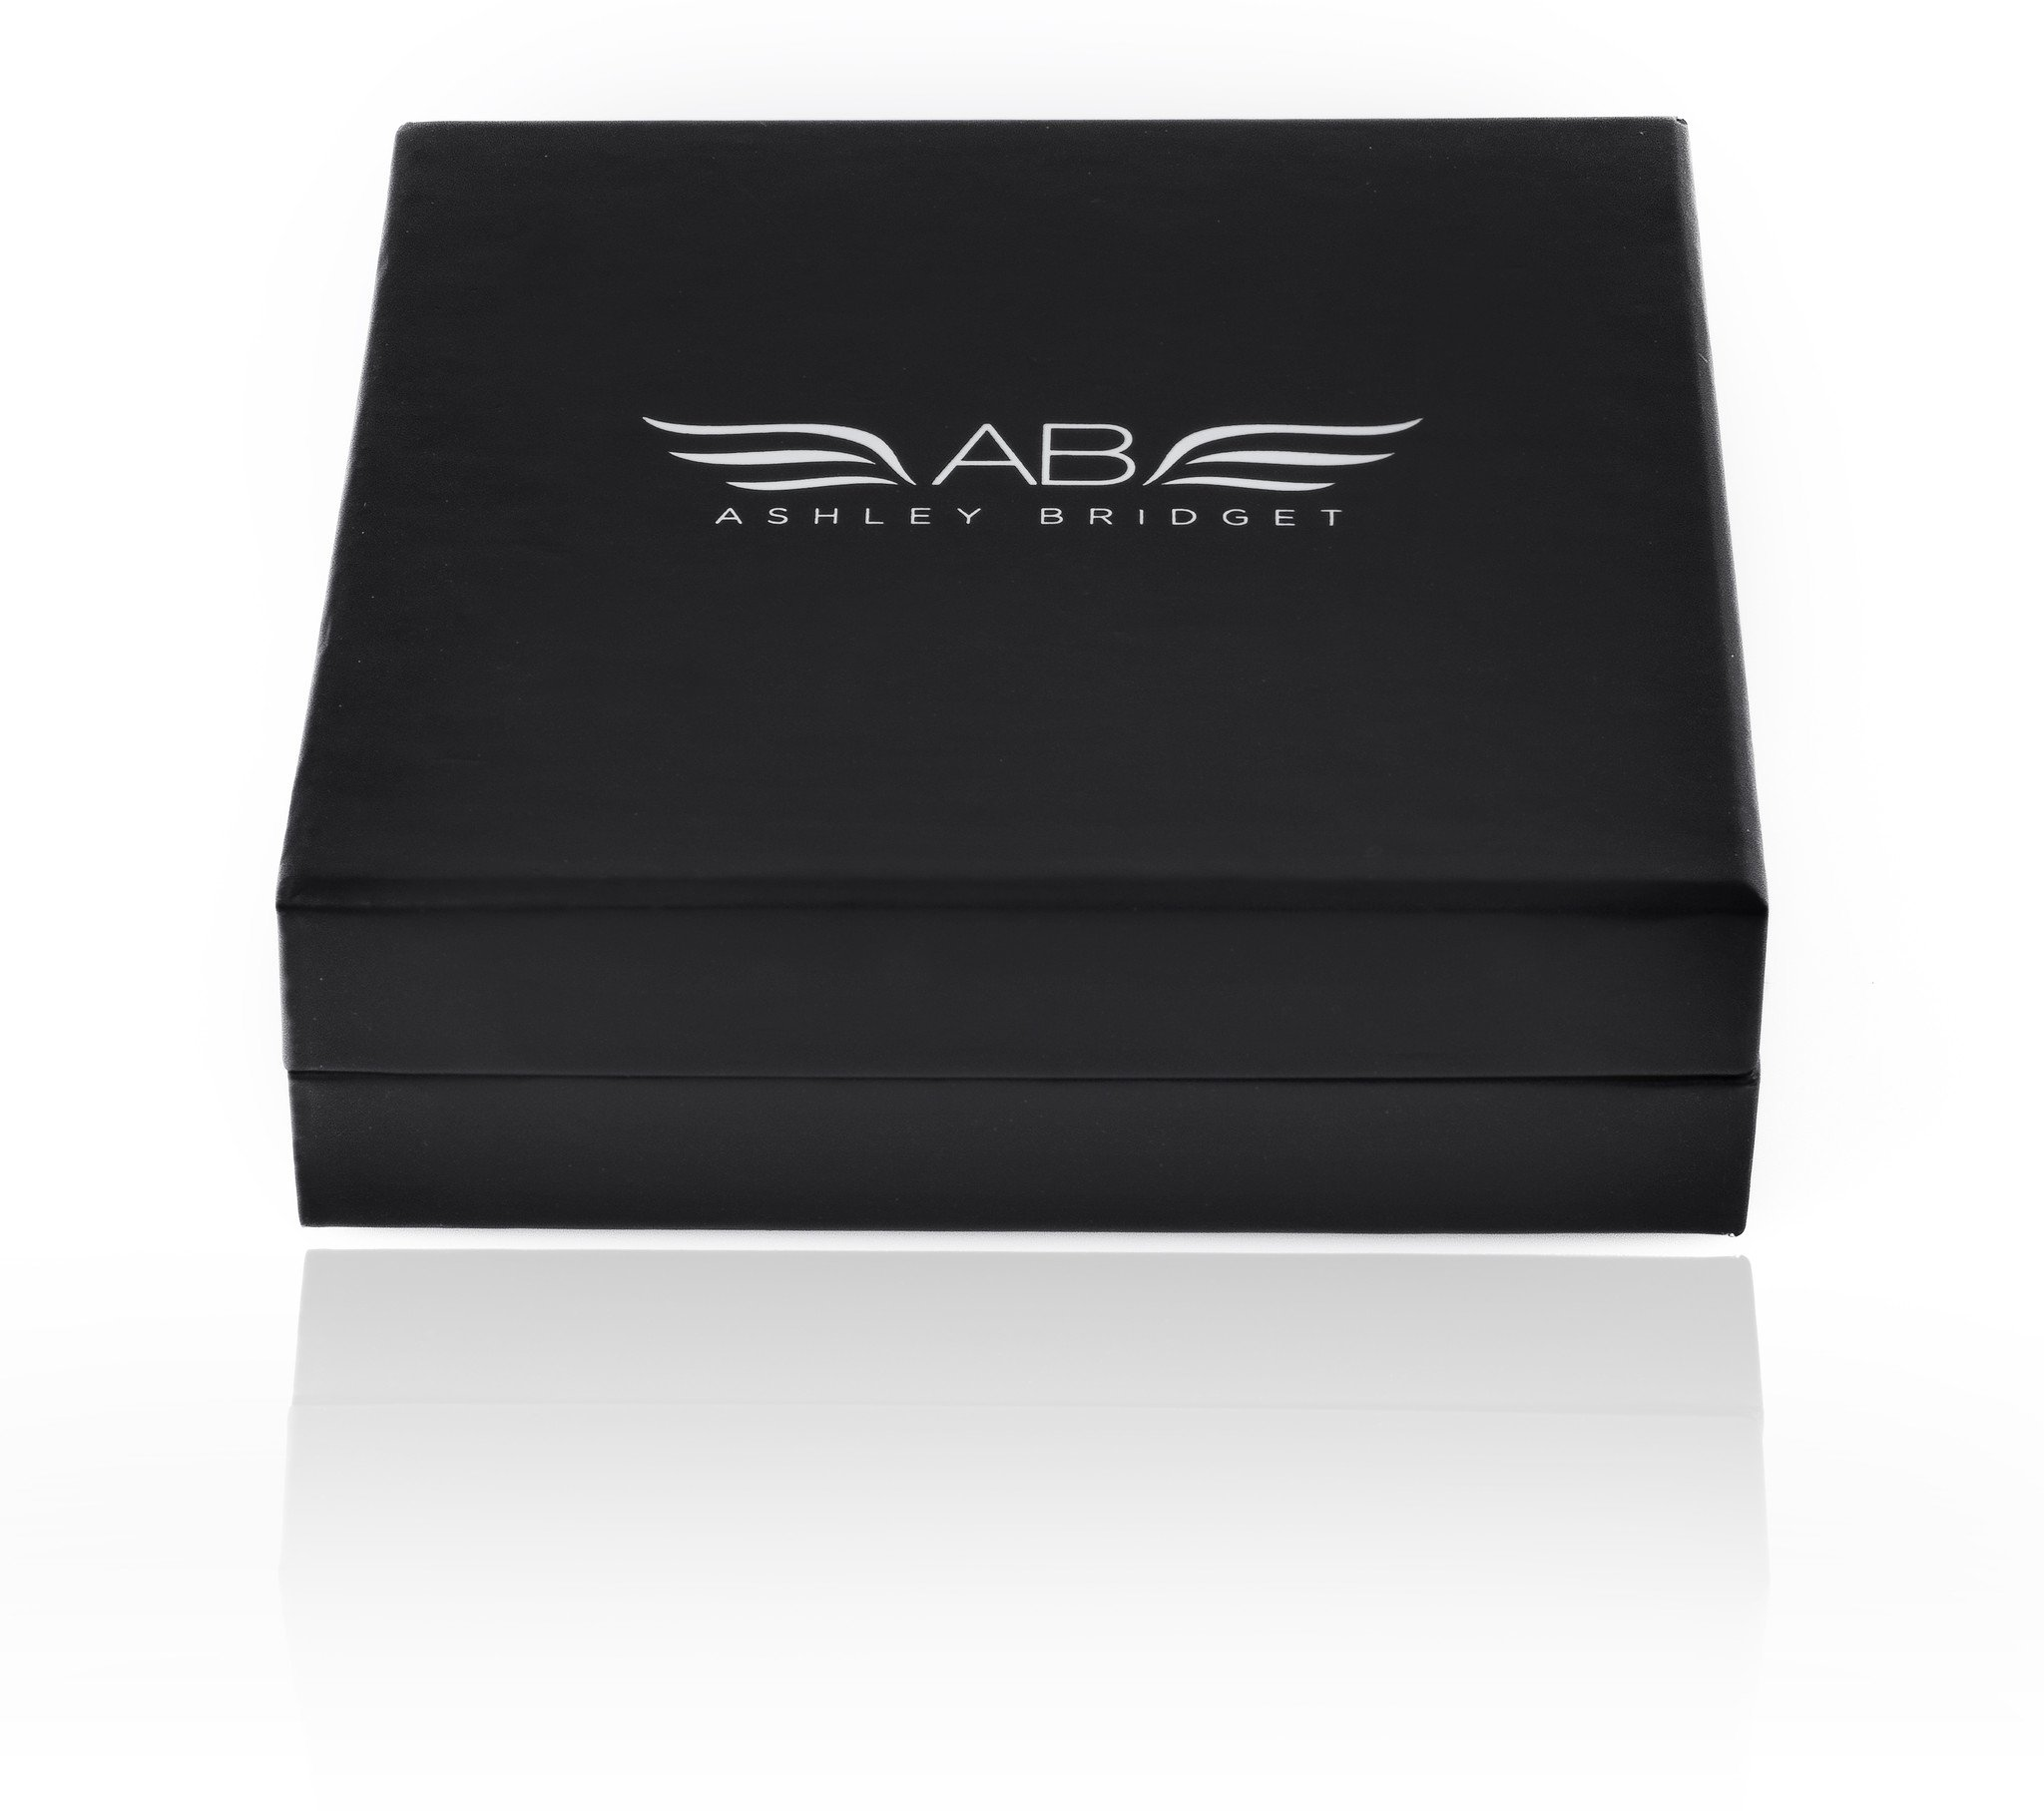 Ashley Bridget Hair Bracelet - Elegant Fashion Jewelry with Elastic Holder Bangle and Gift Box (Silver Plated)